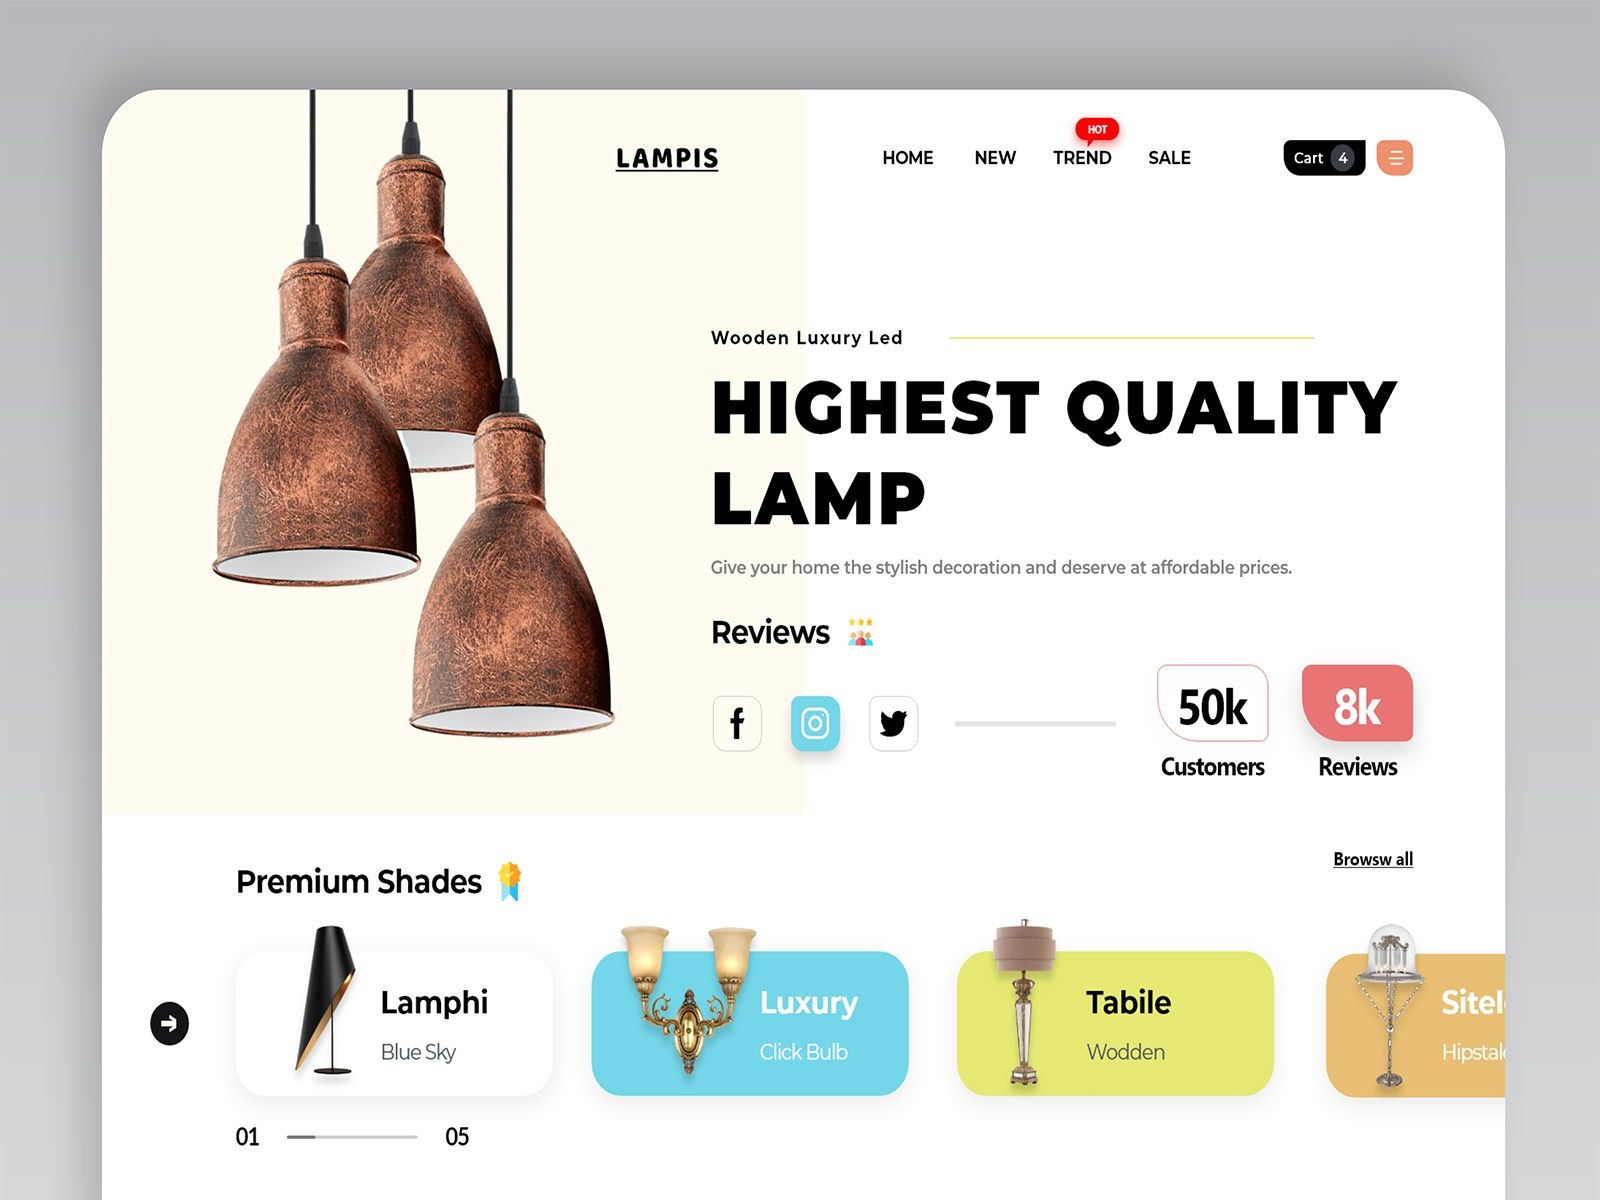 Luxury Lamp Web Design In 2020 Luxury Lamps Web Design Design Jobs